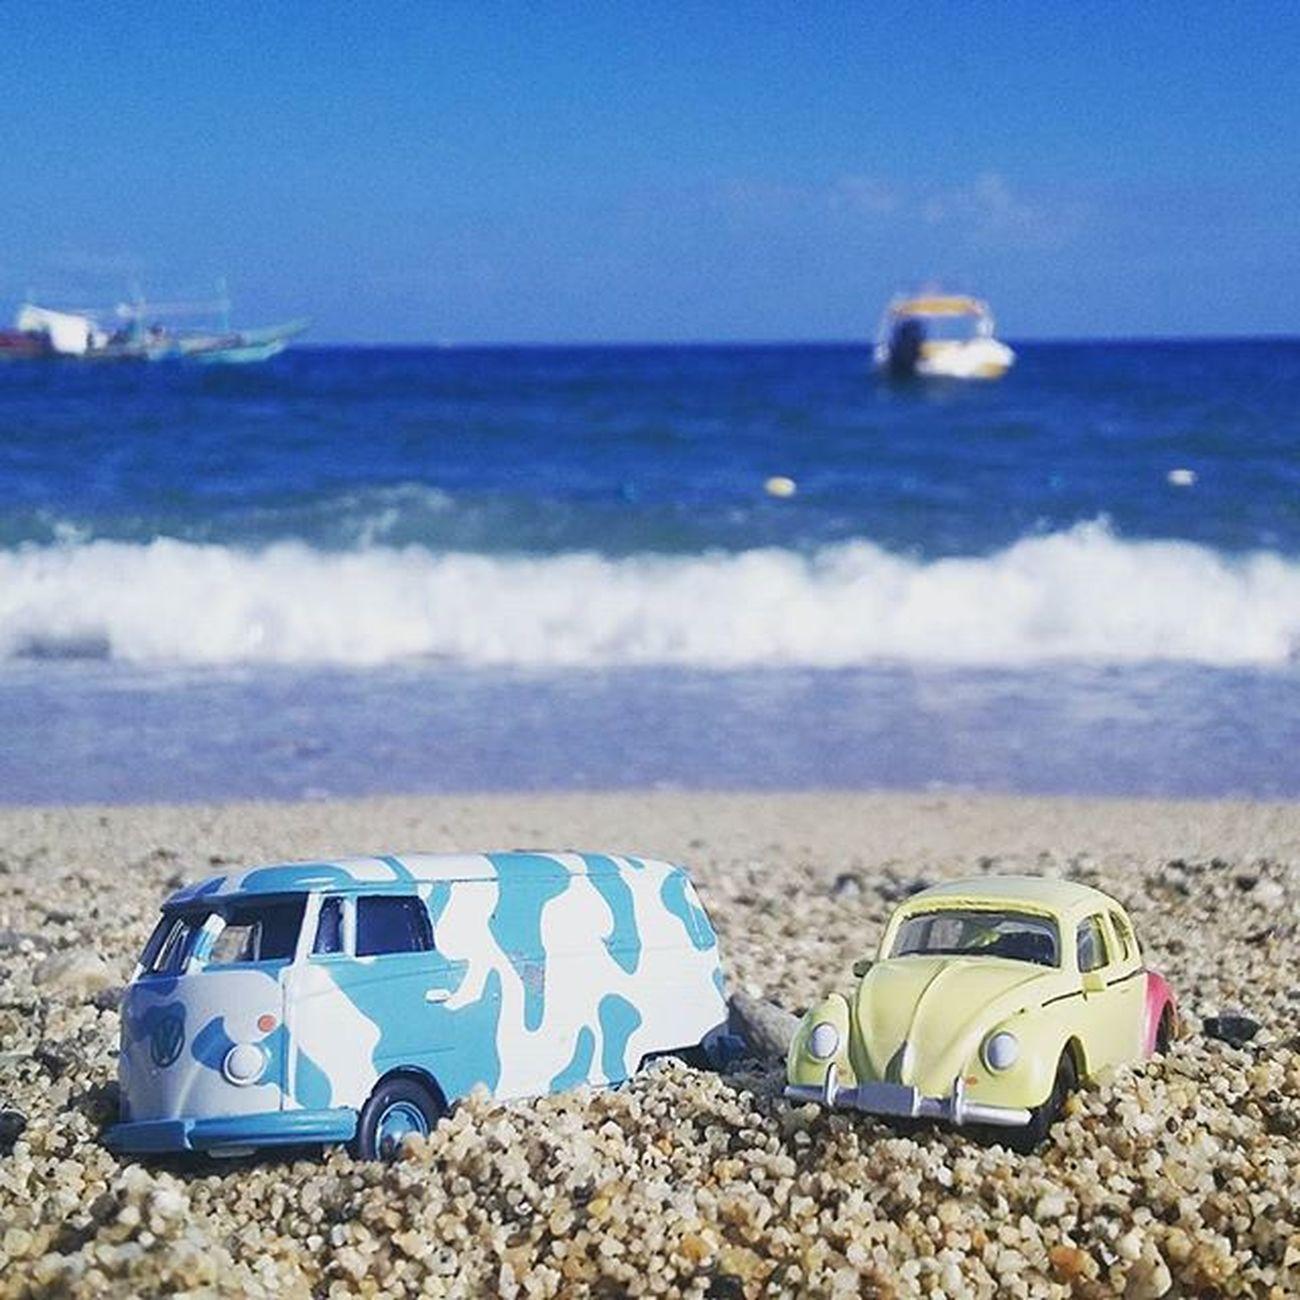 Beach bums be like Volkswagen VW VWbus Vwbeetle Vintage Diecast Beach Summer2016 Sand POTD Wheninlaiya Wheninbatangas Instalike Instaplaces Byahenitin2016 Followstagram Tweegram Melikey Megusta Instadaily Summer Toycars @garagetravel Travelgram Instagood Instamood dasauto